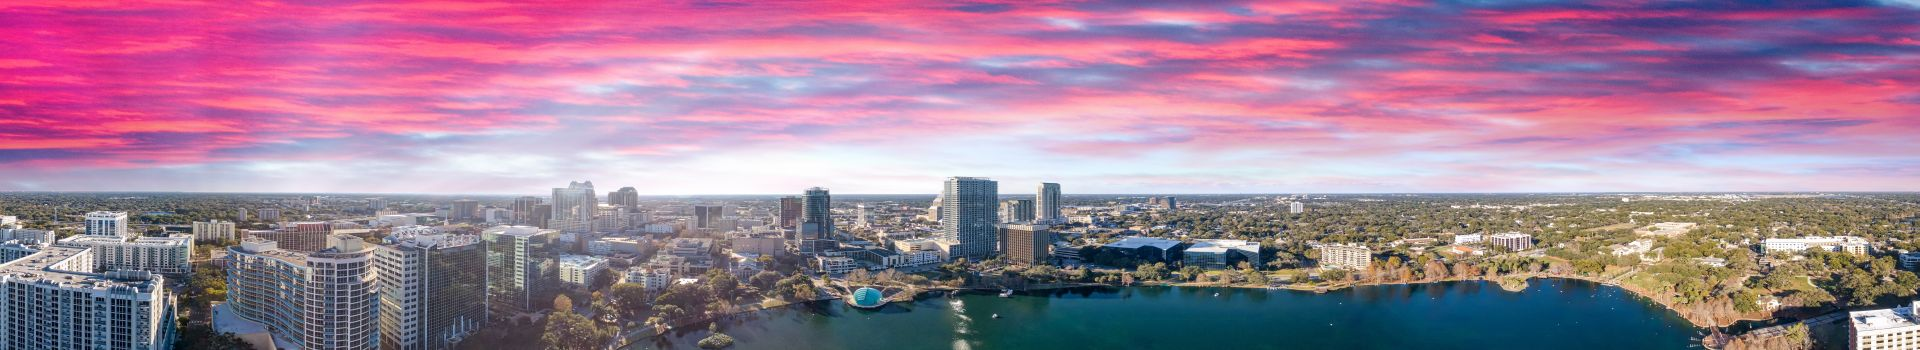 Orlando, FL Pana resized